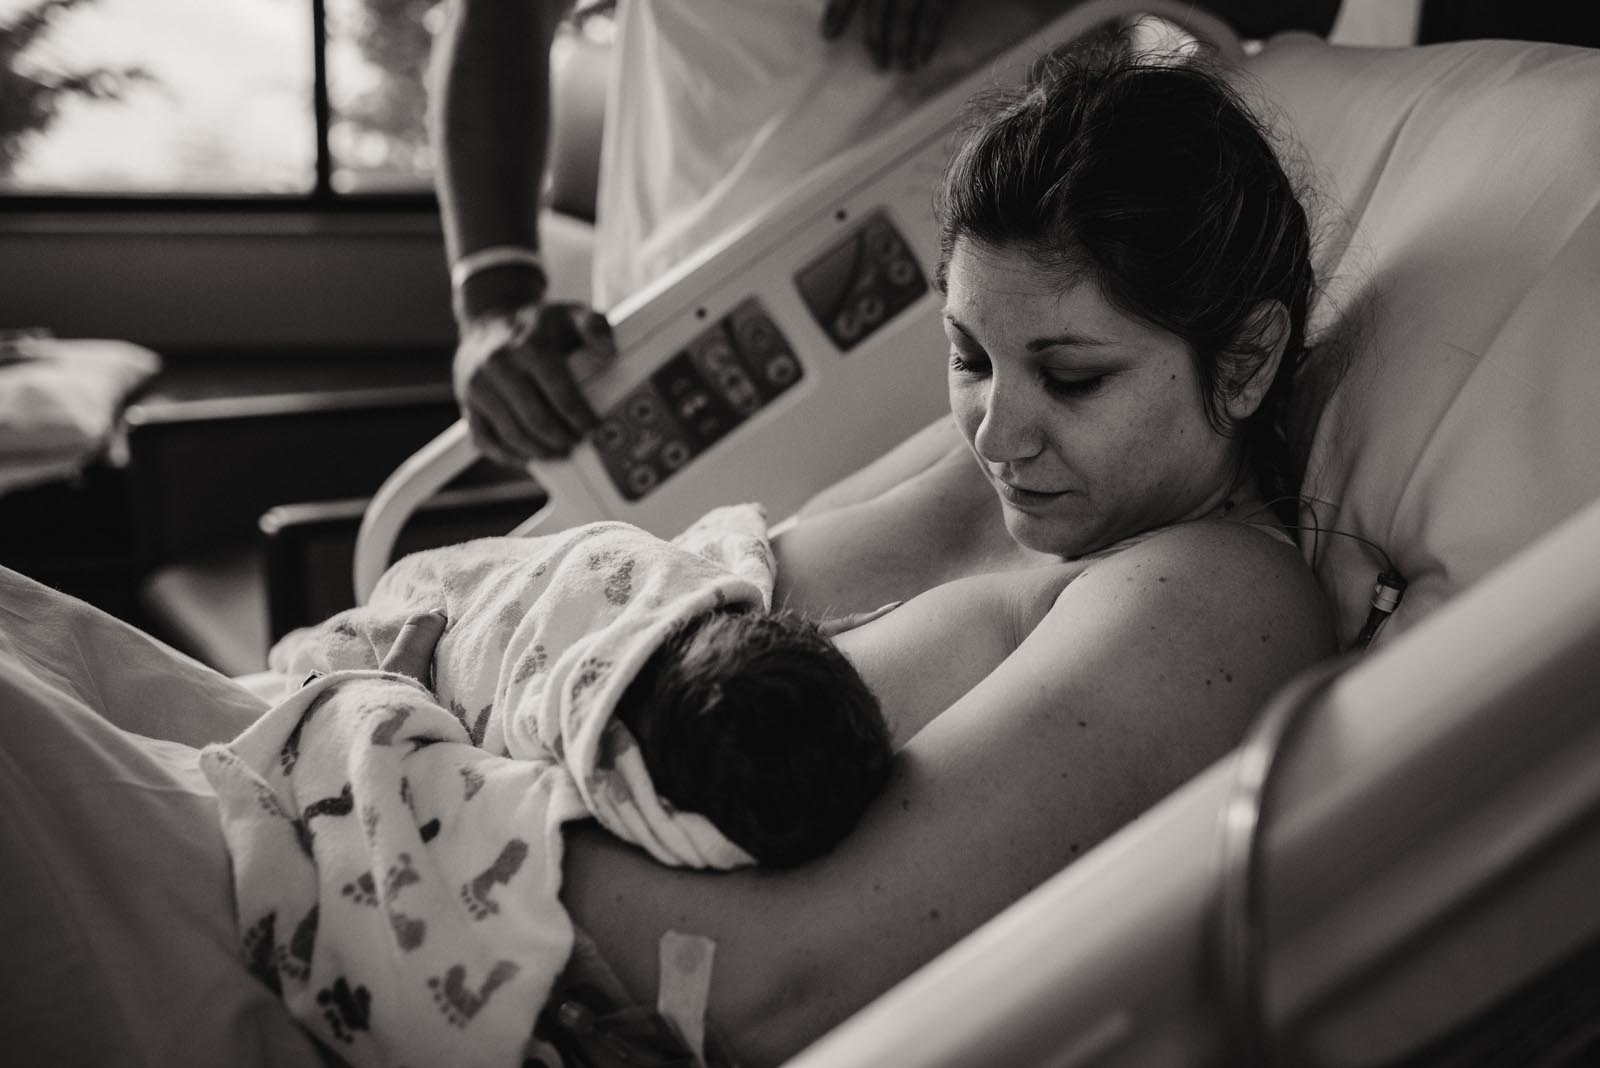 Ali's Birth Story - Legacy Mt Hood Family Birth Center in Gresham, OR